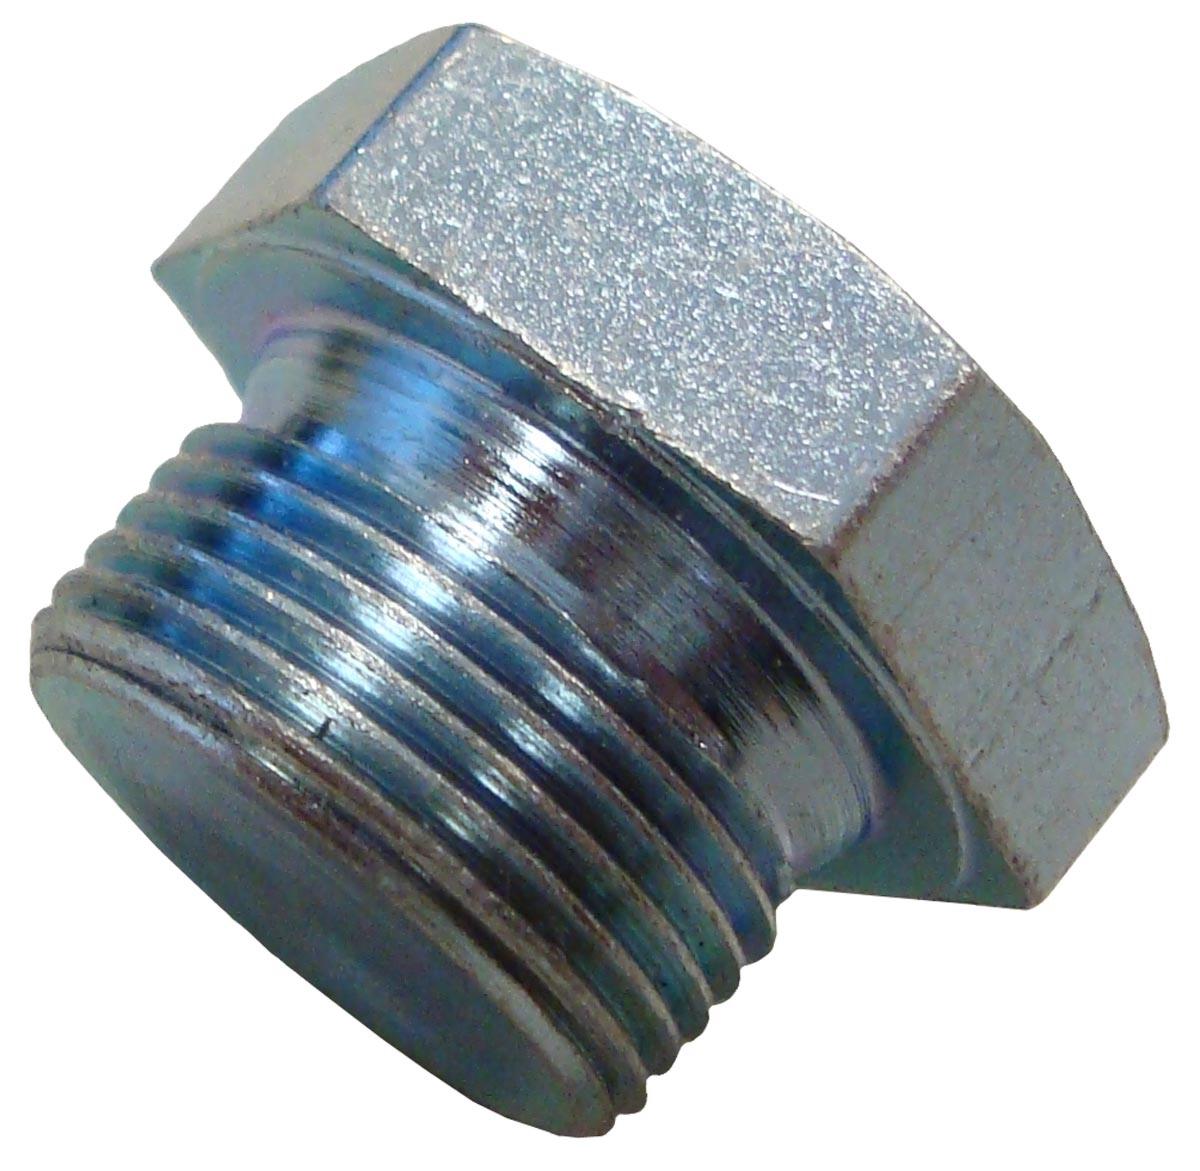 Oil Pan Drain Plug For 2001-2009 Freightliner Classic XL; Engine Oil Drain Plug